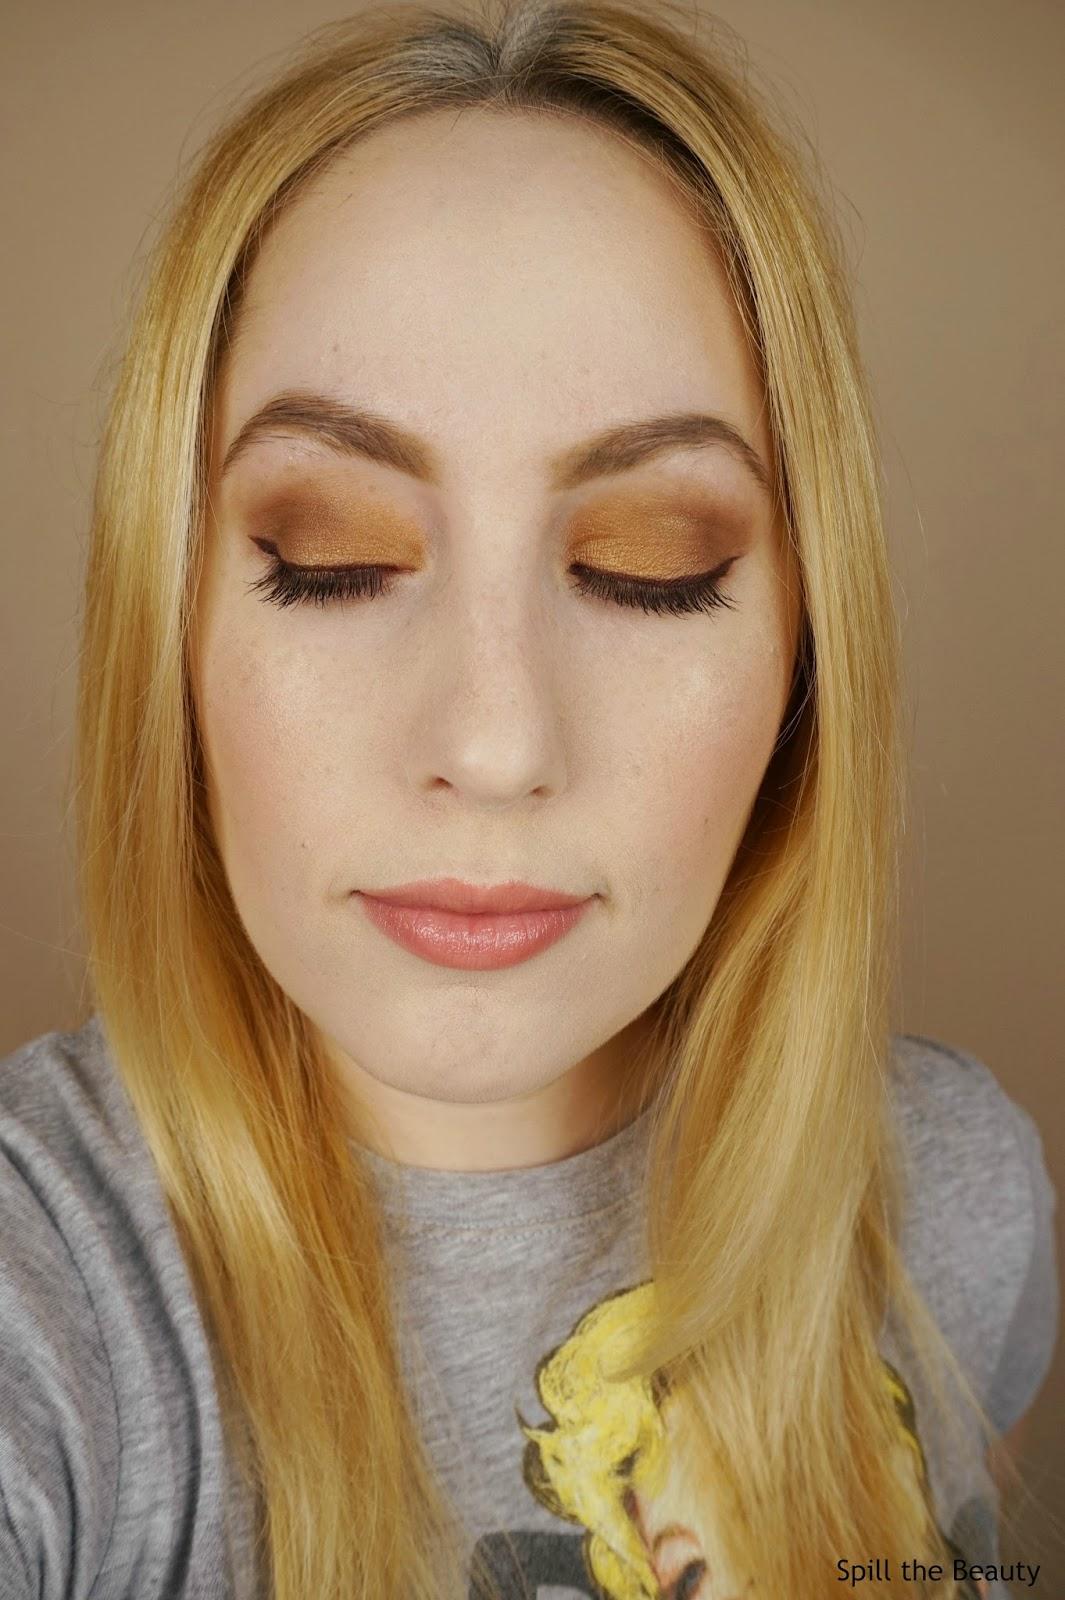 joe fresh 2017 eyeshadow eyeliner highlighter stick lip balm review swatches